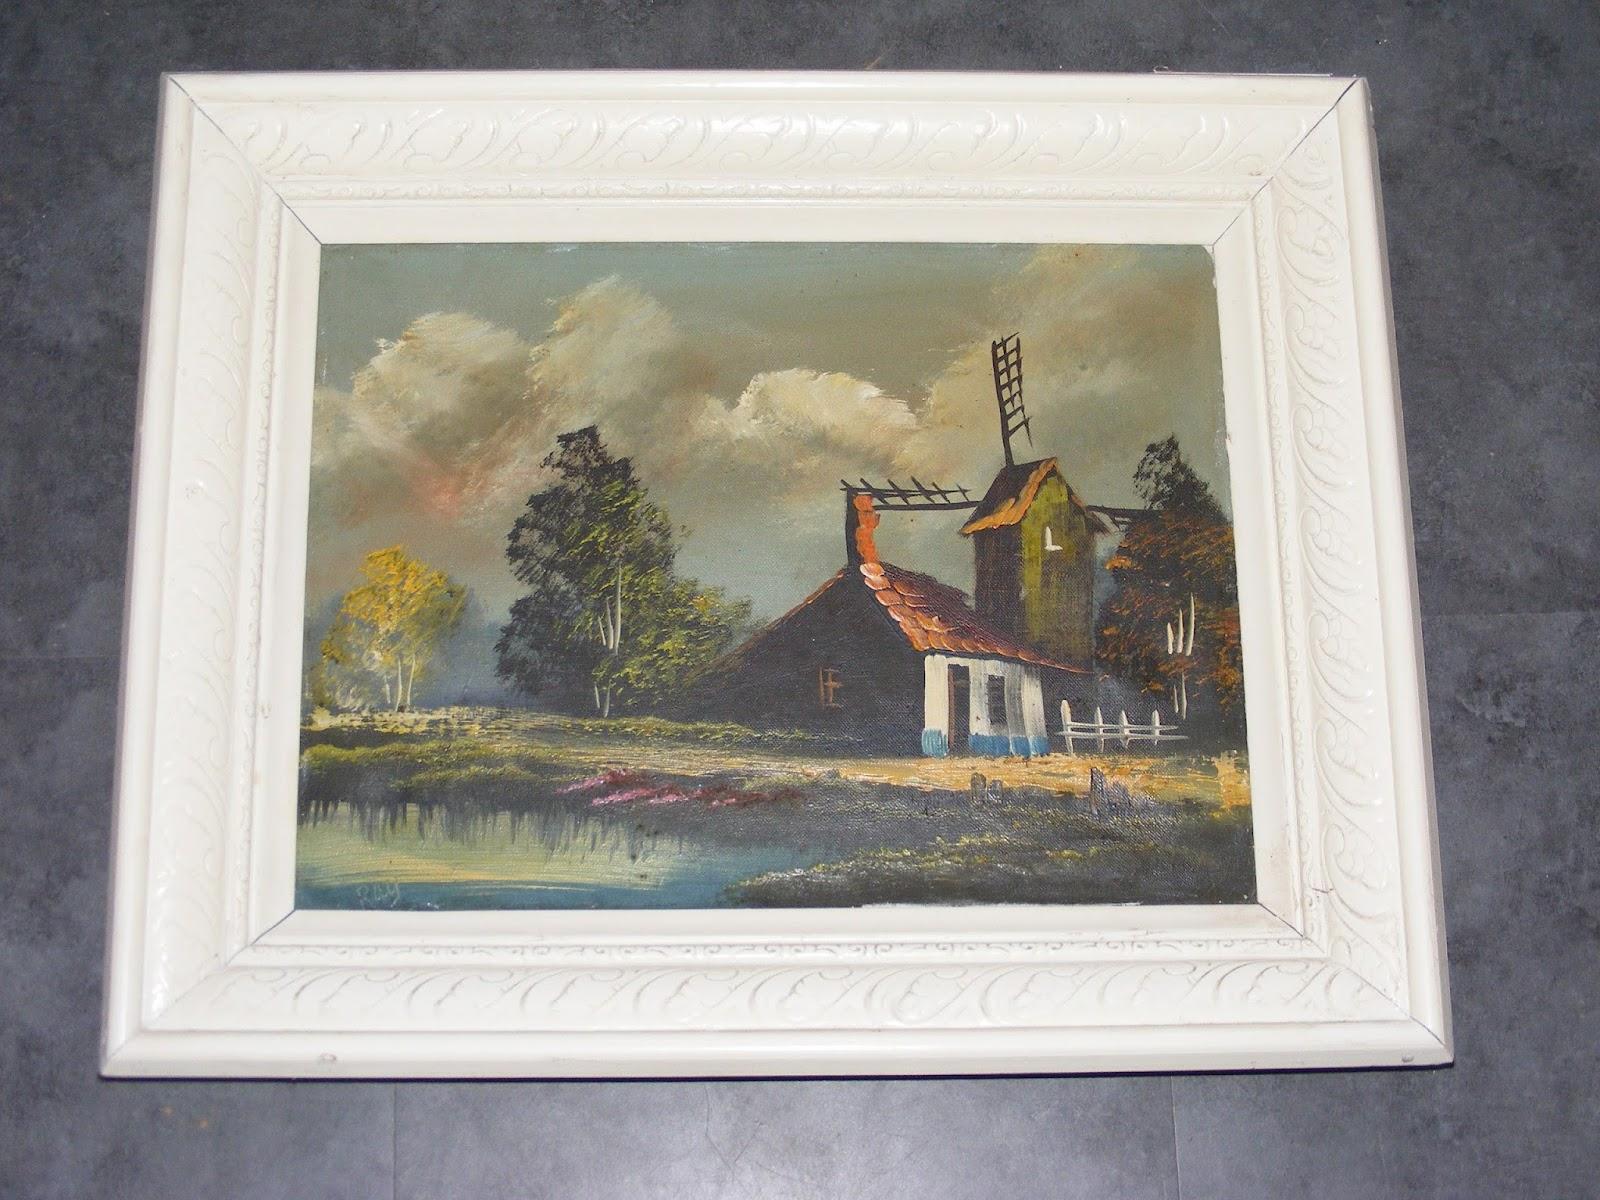 cadre en bois sculpte patine blanche huile sur toile signee ray cadr206 ebay. Black Bedroom Furniture Sets. Home Design Ideas